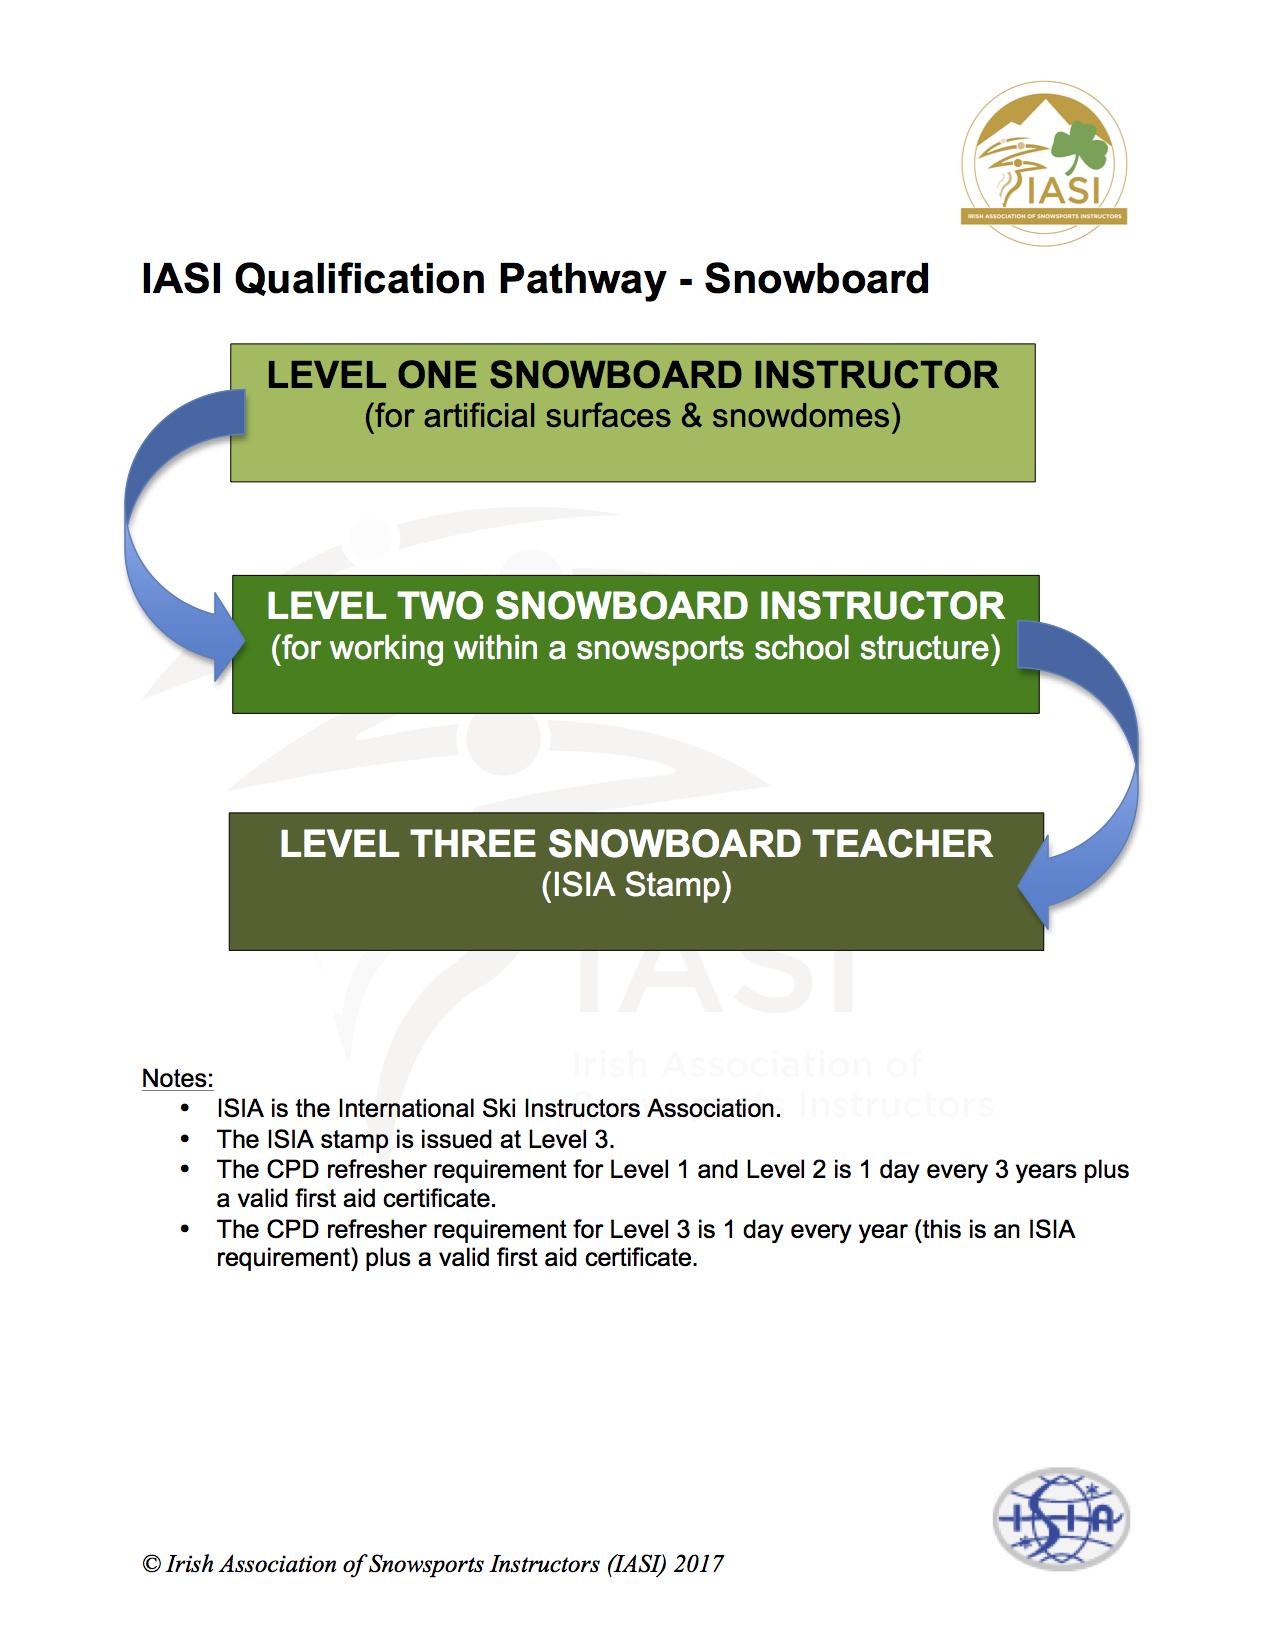 IASI Qualification Pathway SB